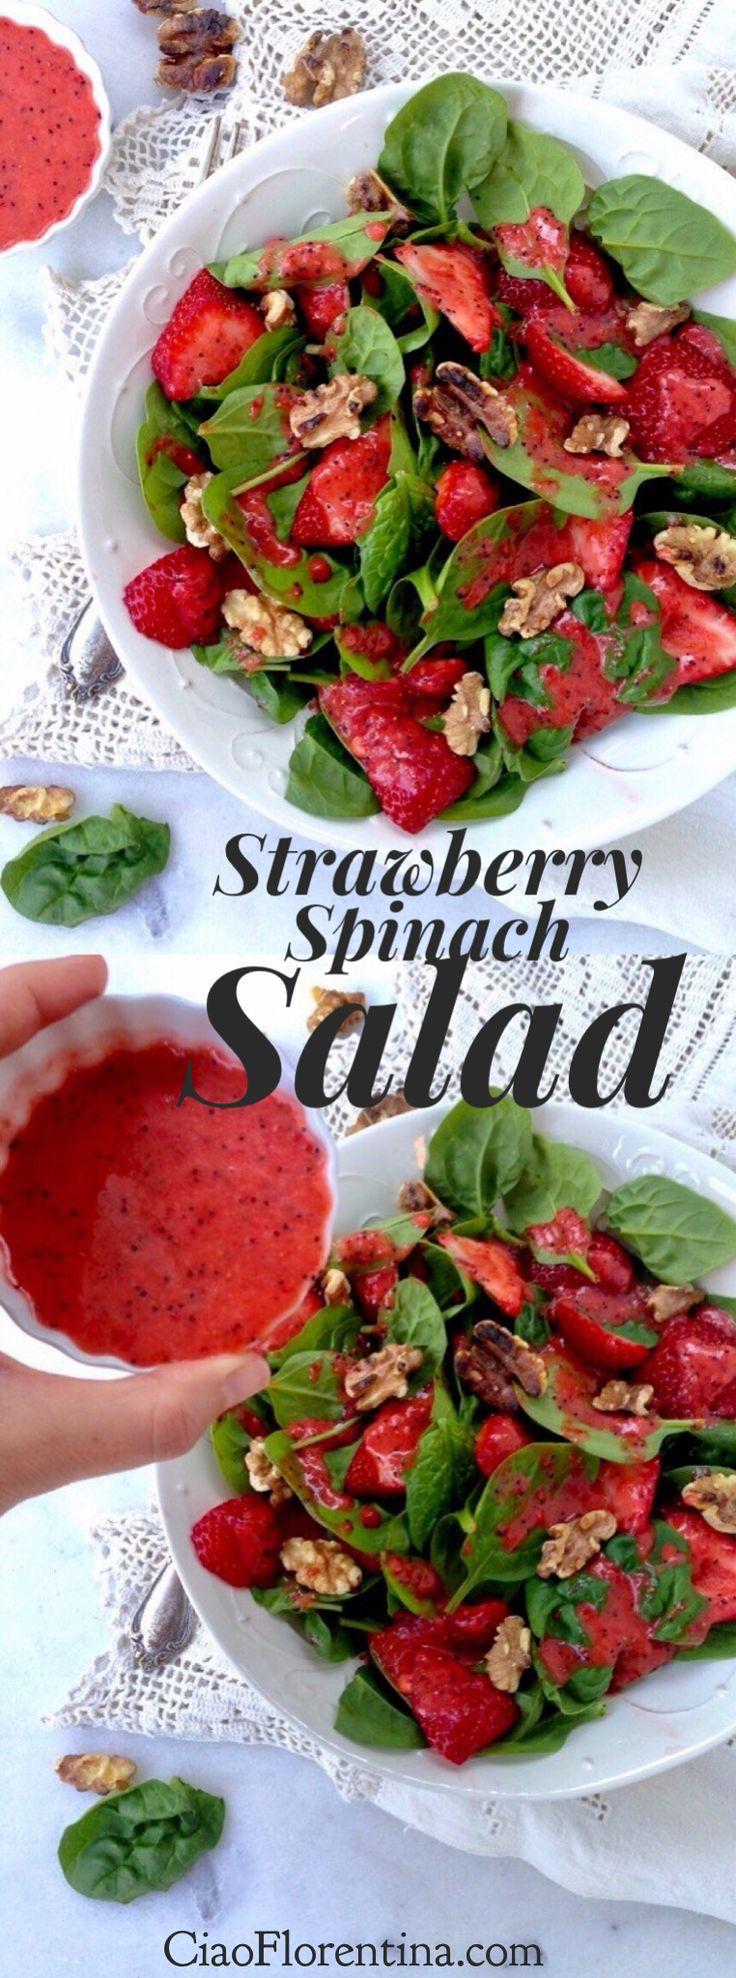 Strawberry Spinach Salad Recipe with Lemon Poppyseed Dressing     CiaoFlorentina.com @CiaoFlorentina